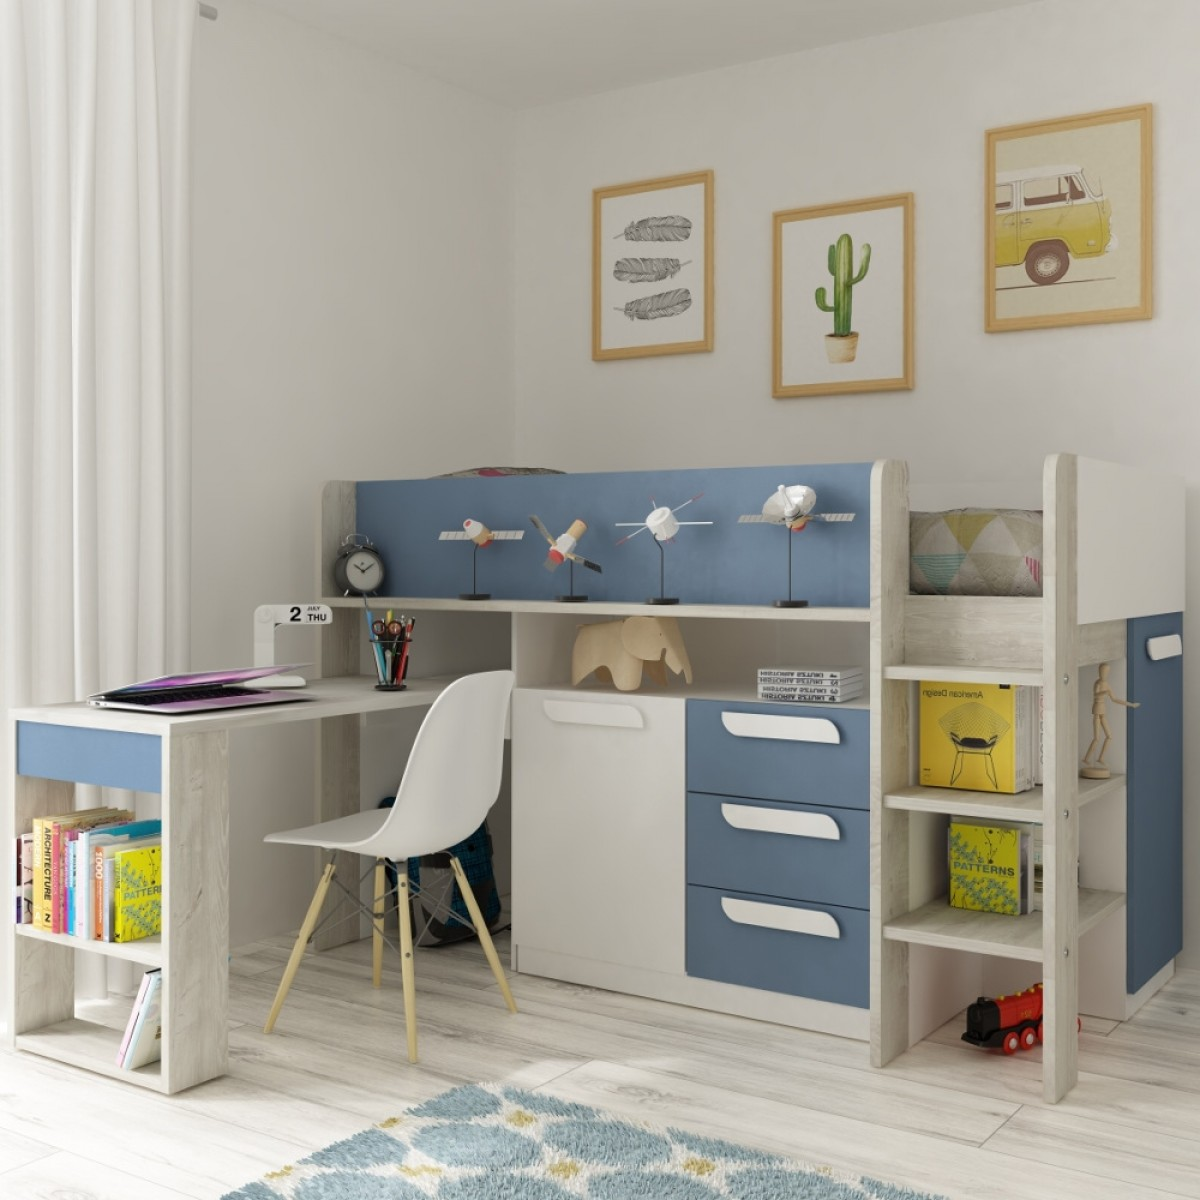 Girona Blue and Oak Wooden Mid Sleeper